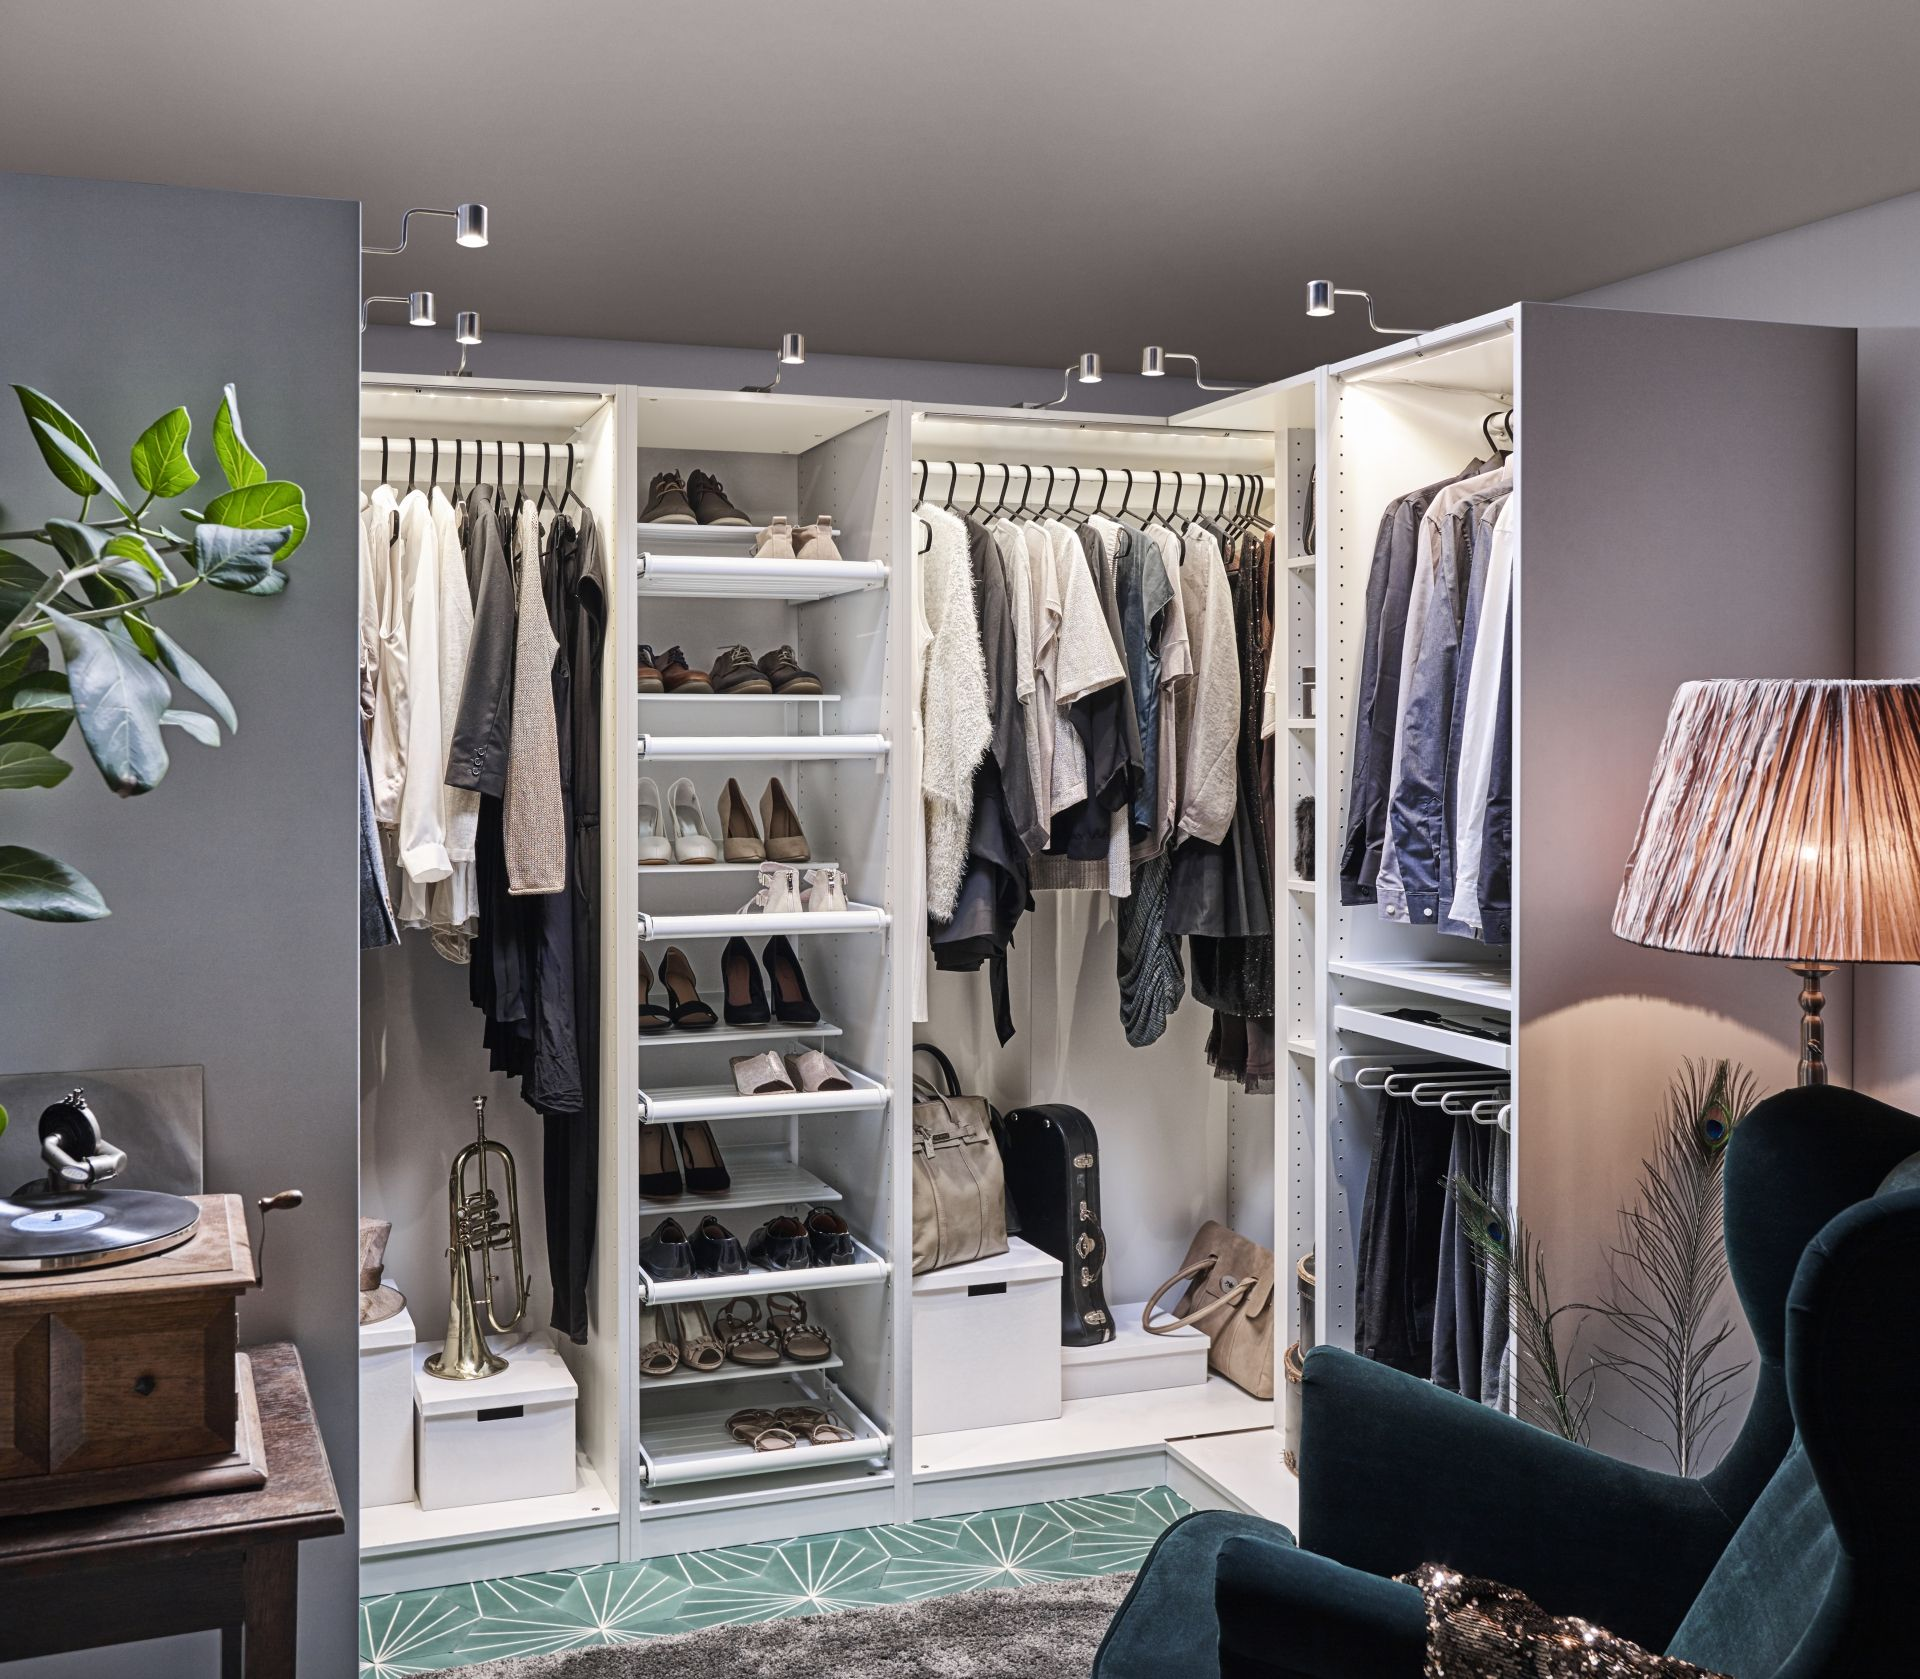 Pax Kledingkastsysteem My Home In 2019 Ikea Kledingkast